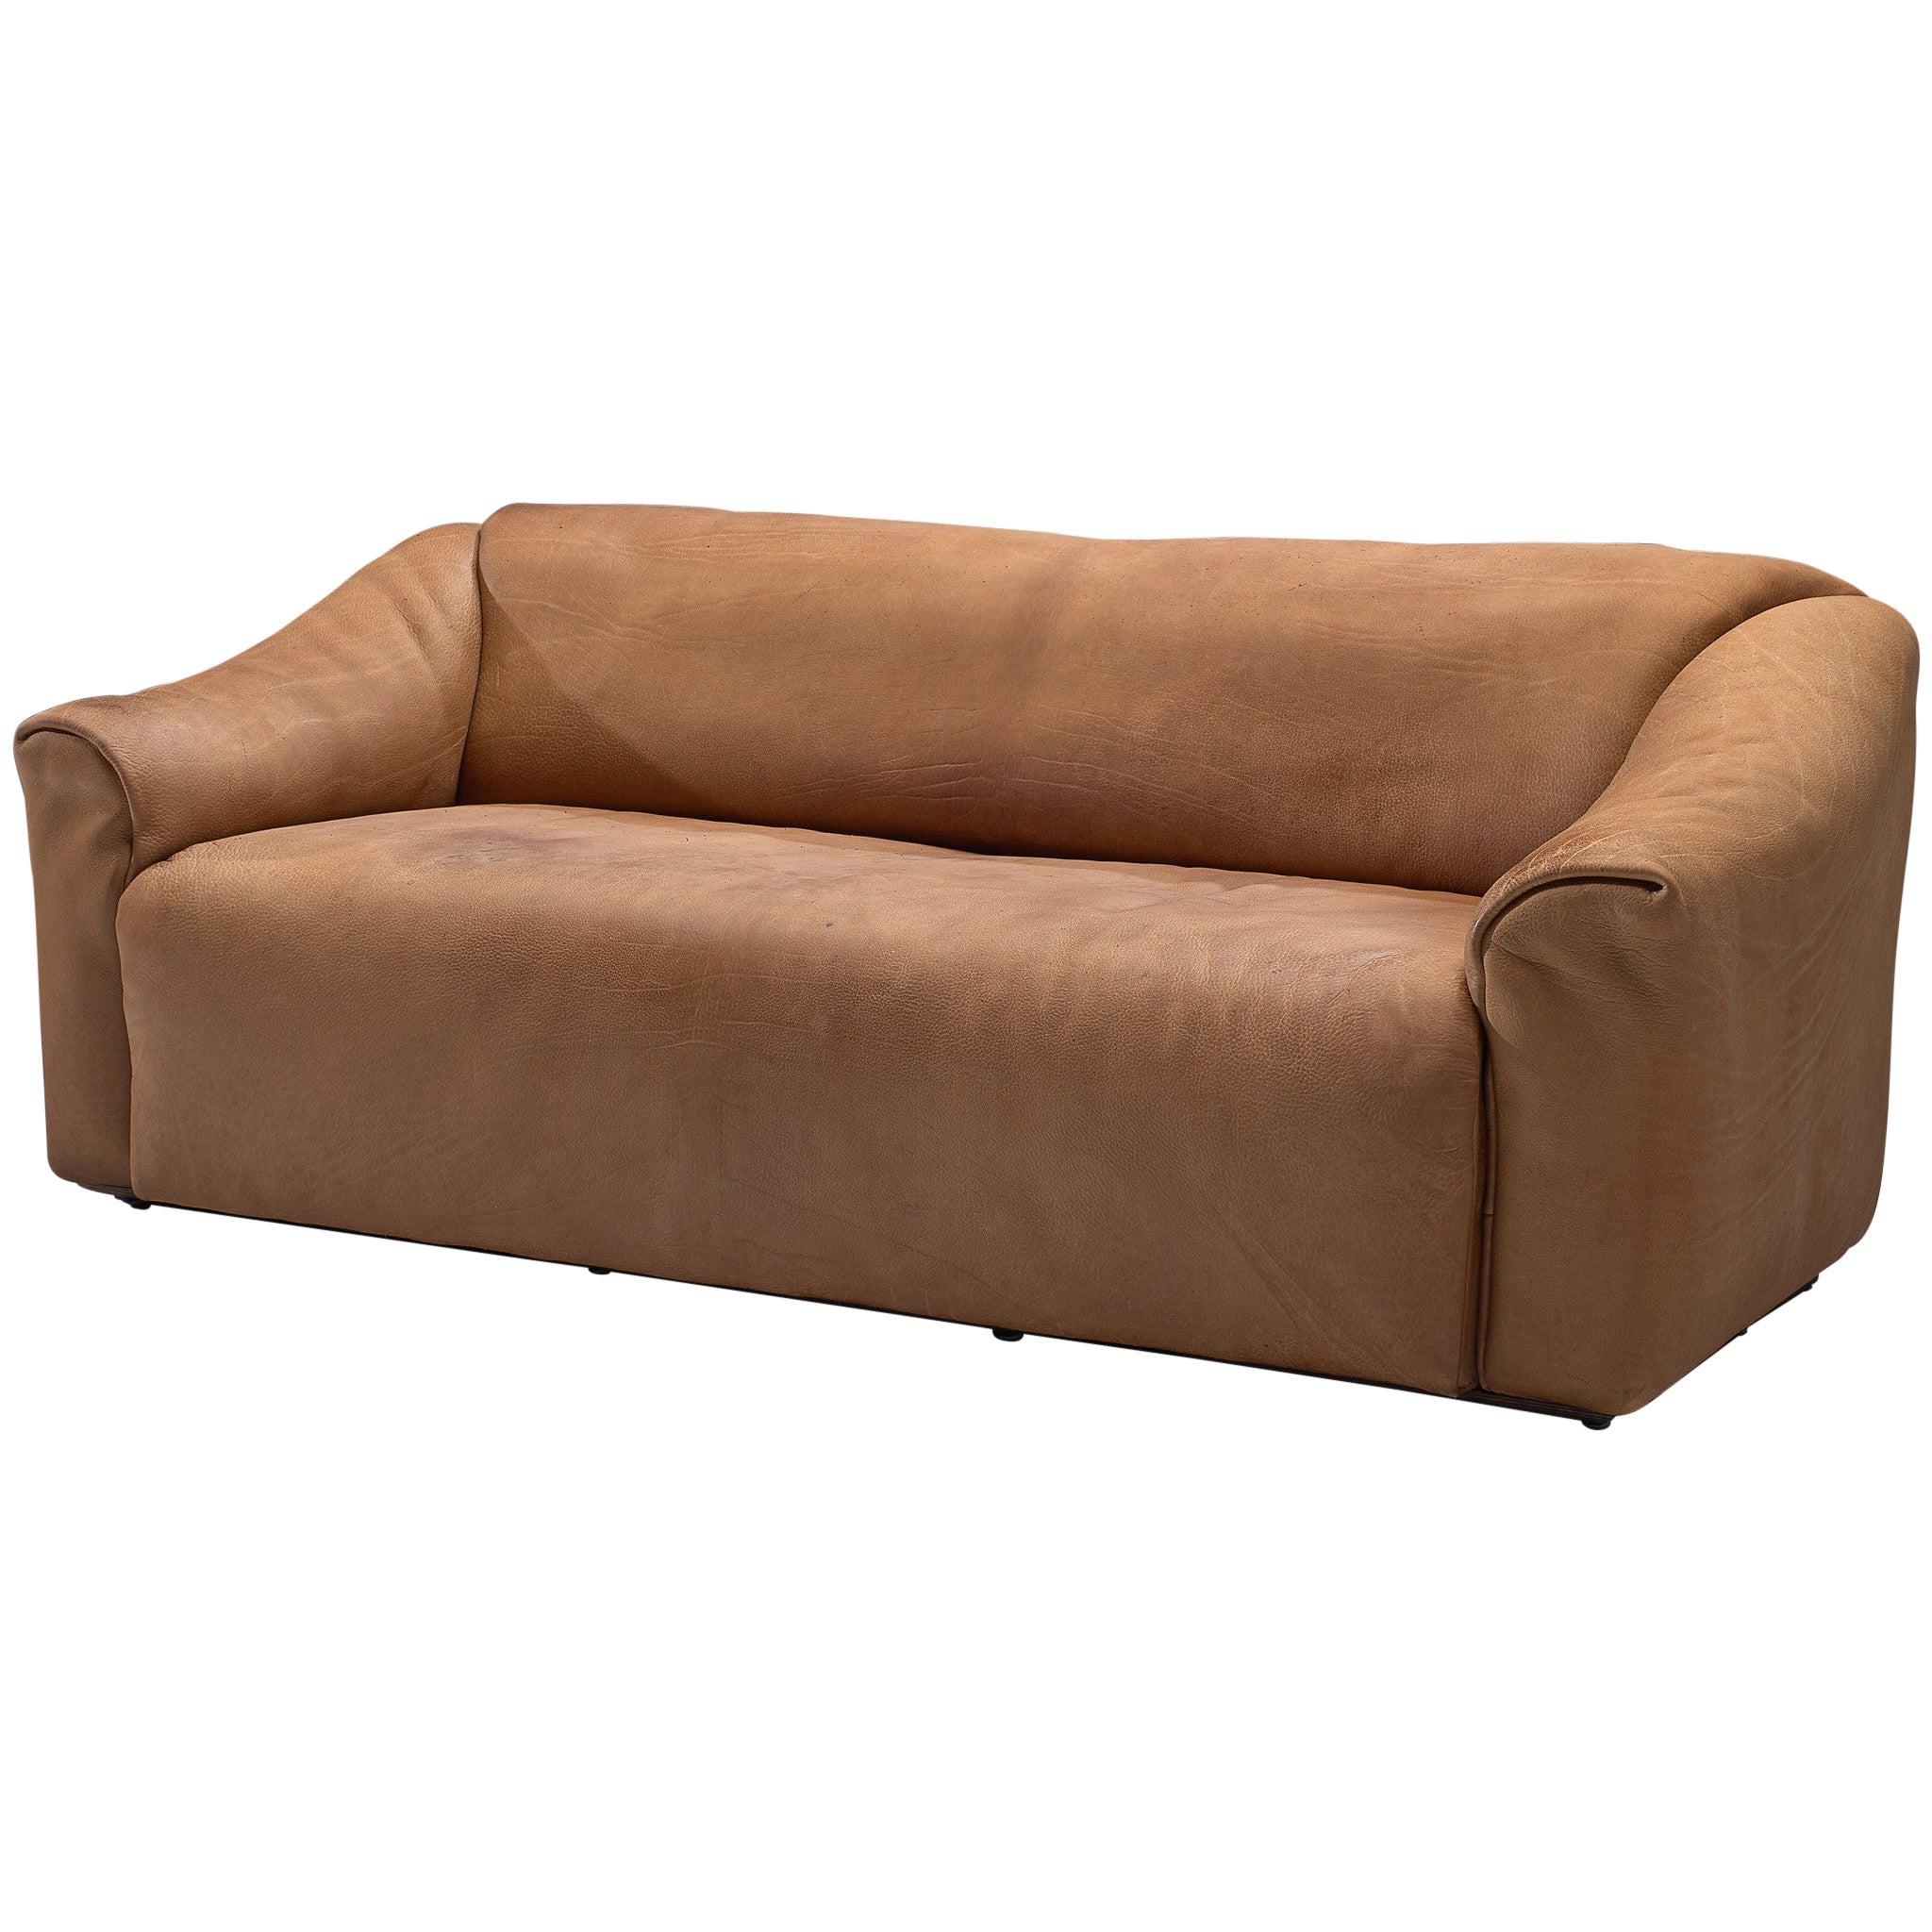 De Sede DS-47 Sofa in Cognac Leather